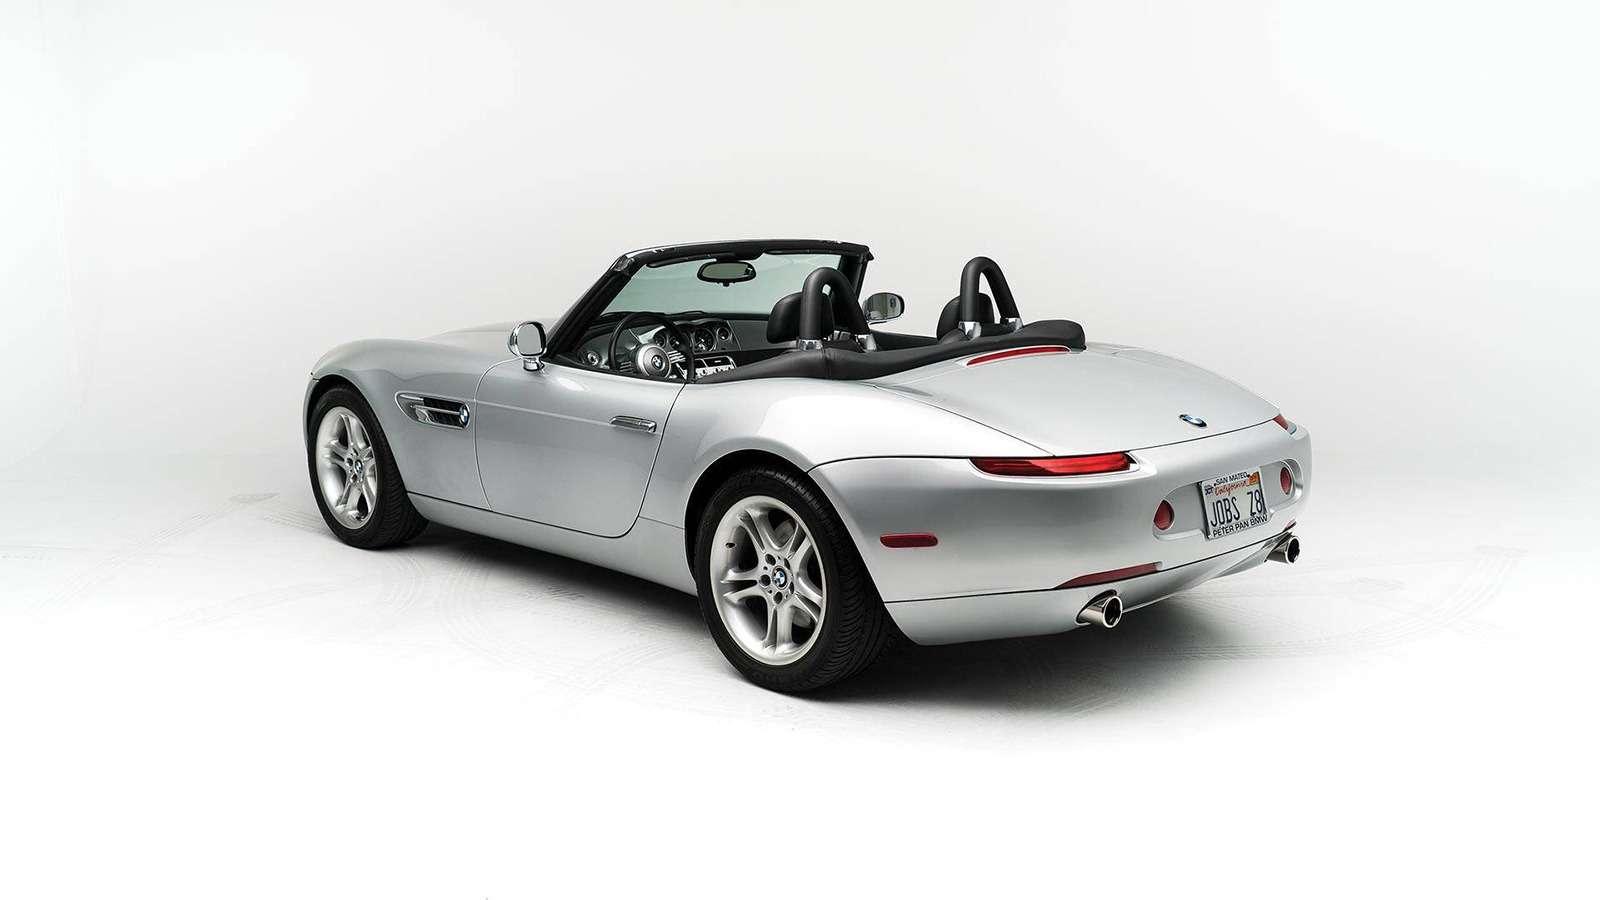 Автомобиль Стива Джобса продадут саукциона. Вместе стелефоном (ноэто не iPhone)— фото 811156